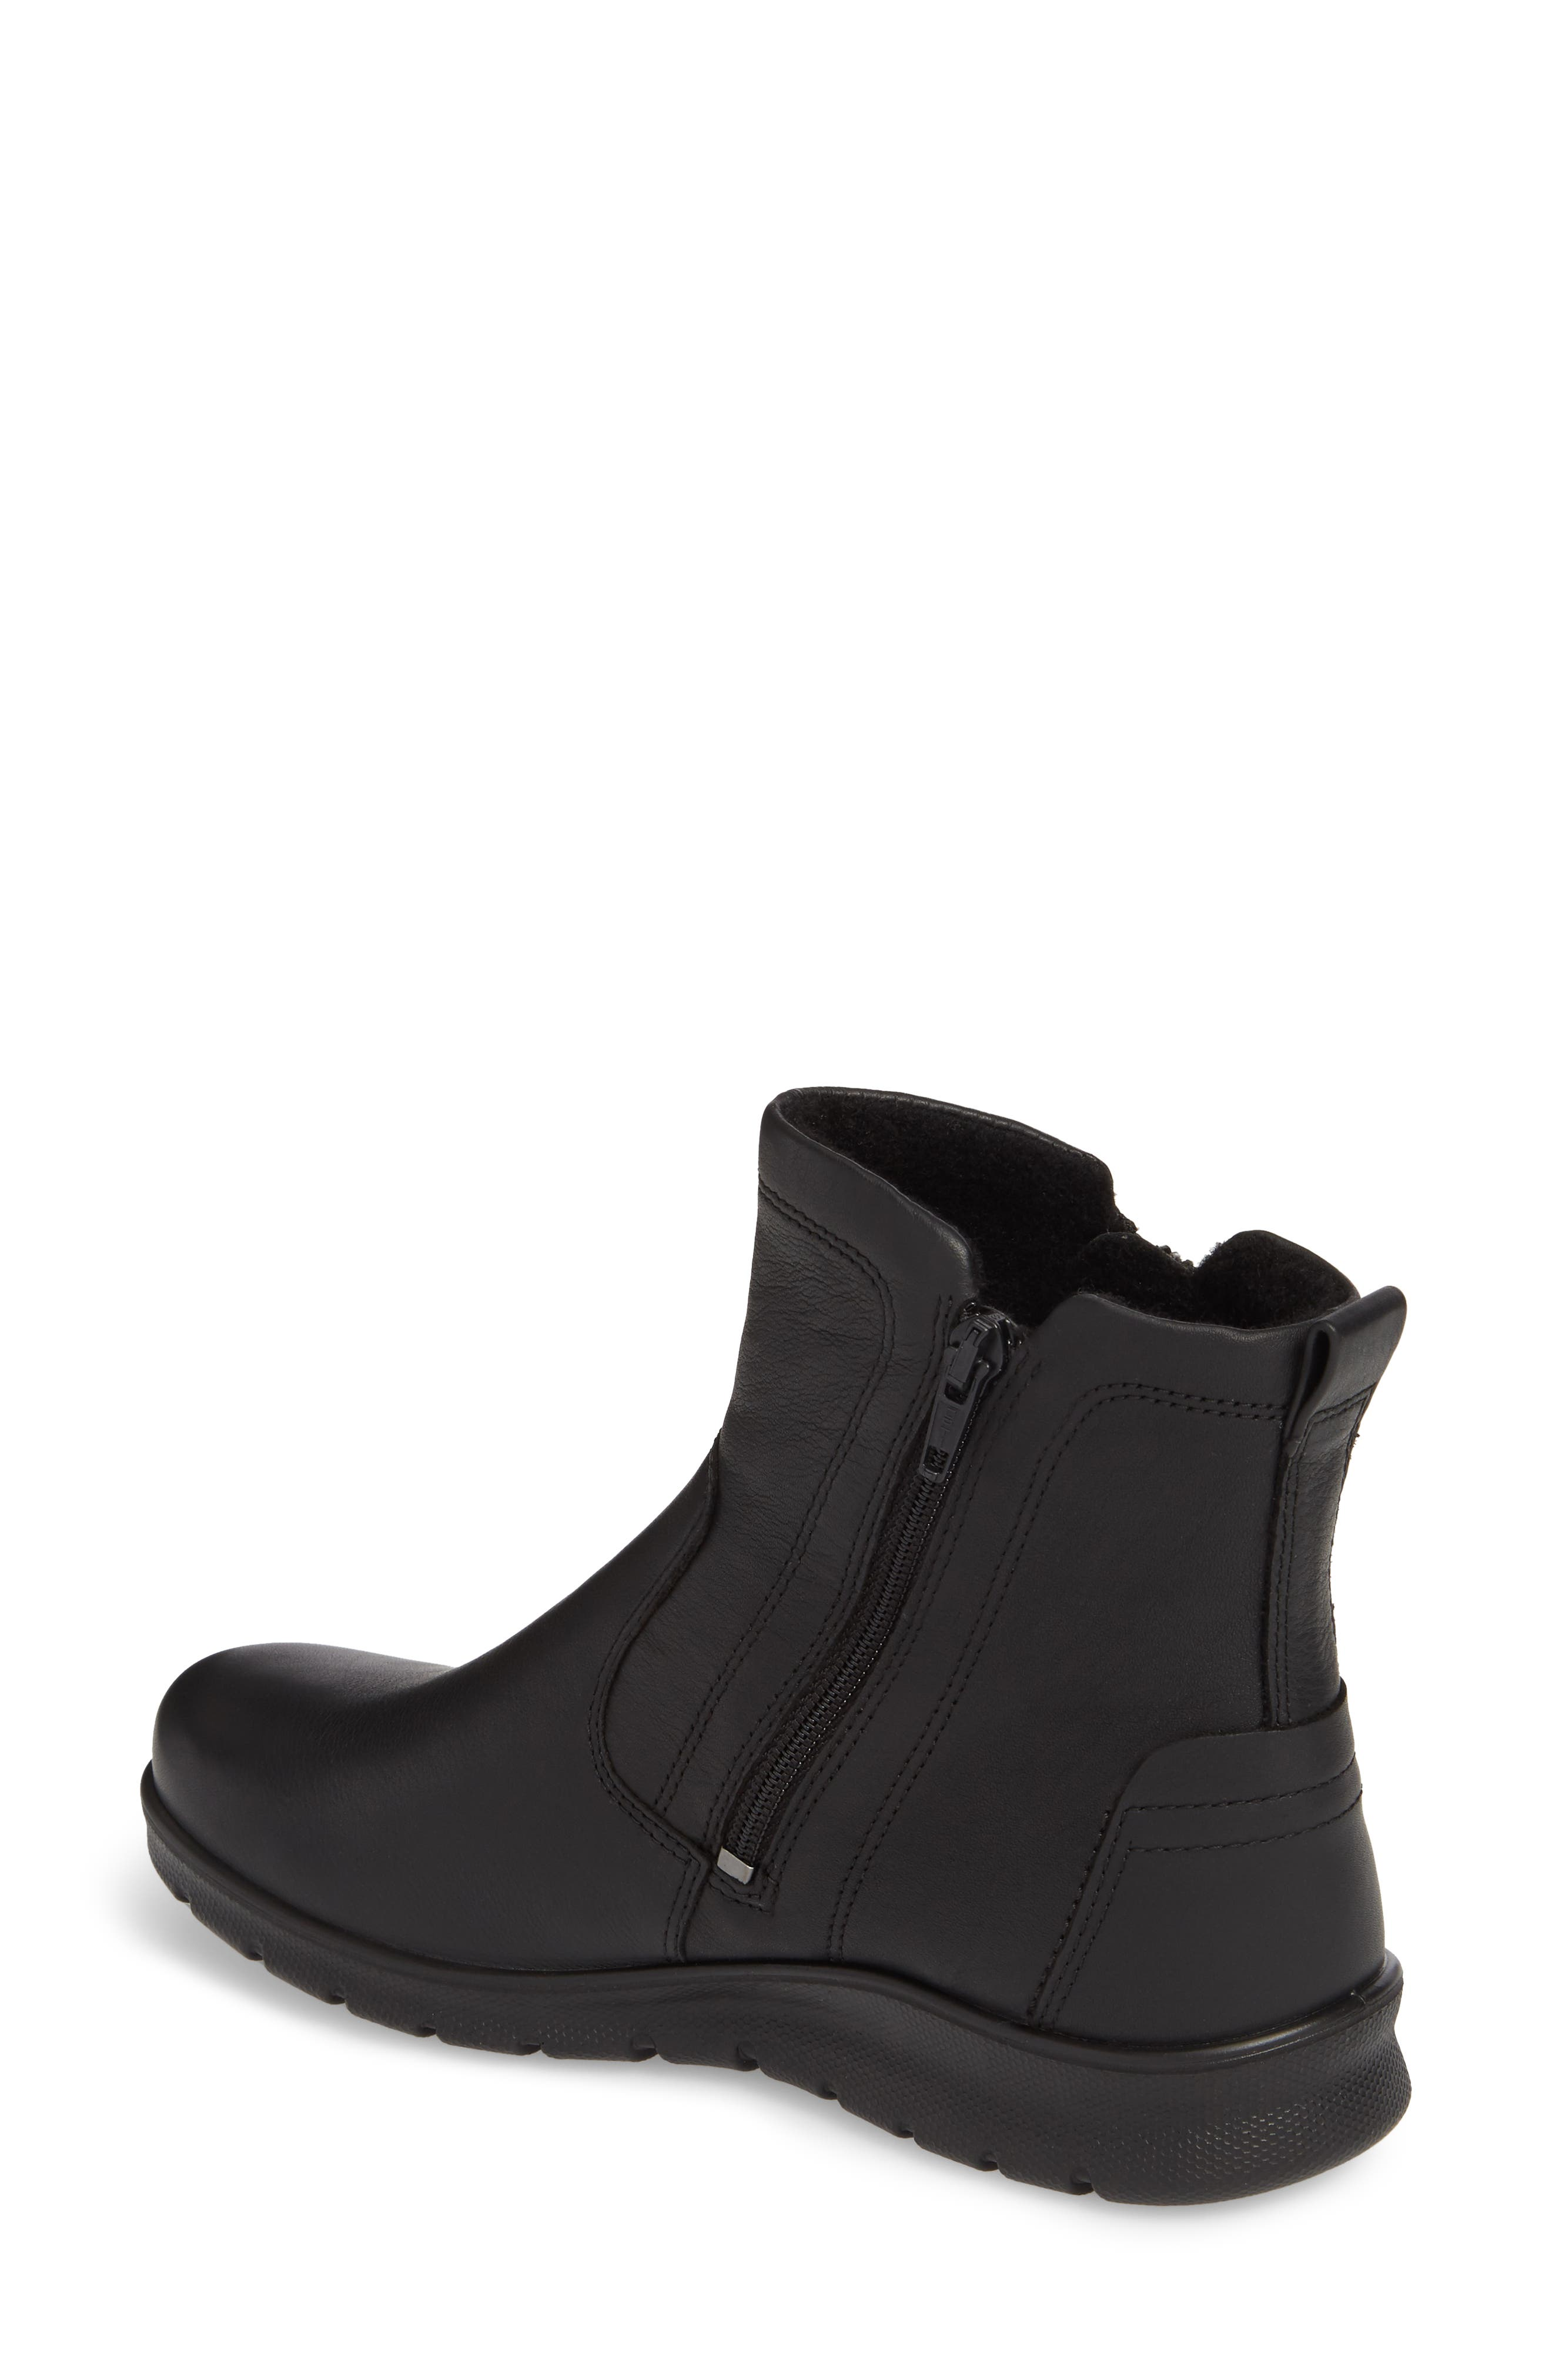 Babett Gore-Tex<sup>®</sup> Bootie,                             Alternate thumbnail 2, color,                             Black Leather